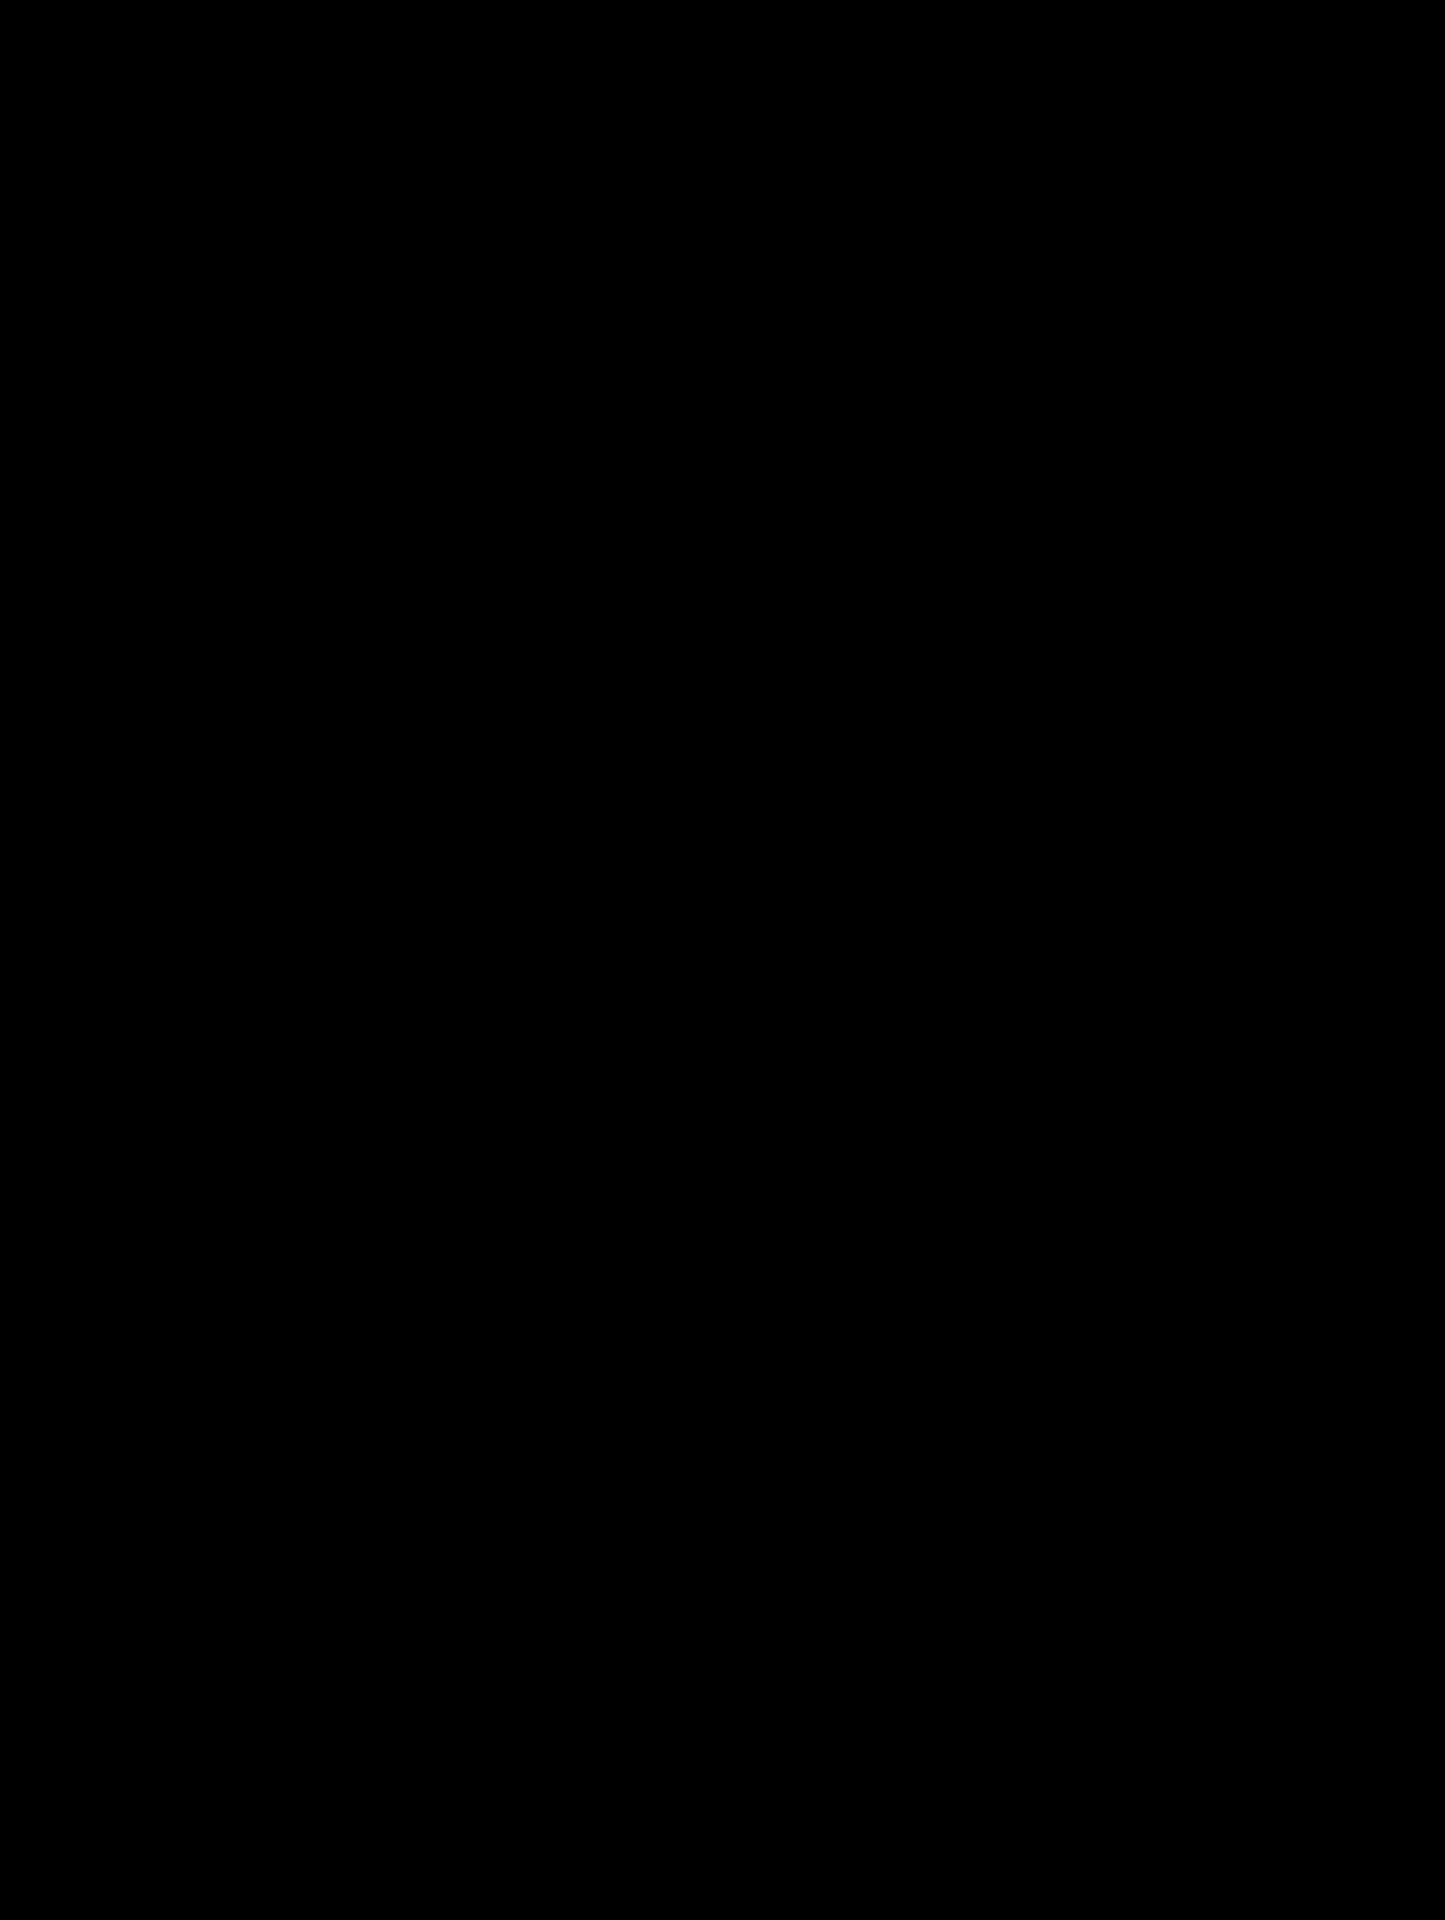 Johan Cruijff: Hans Jouta, Johan Cruijff Arena 2020